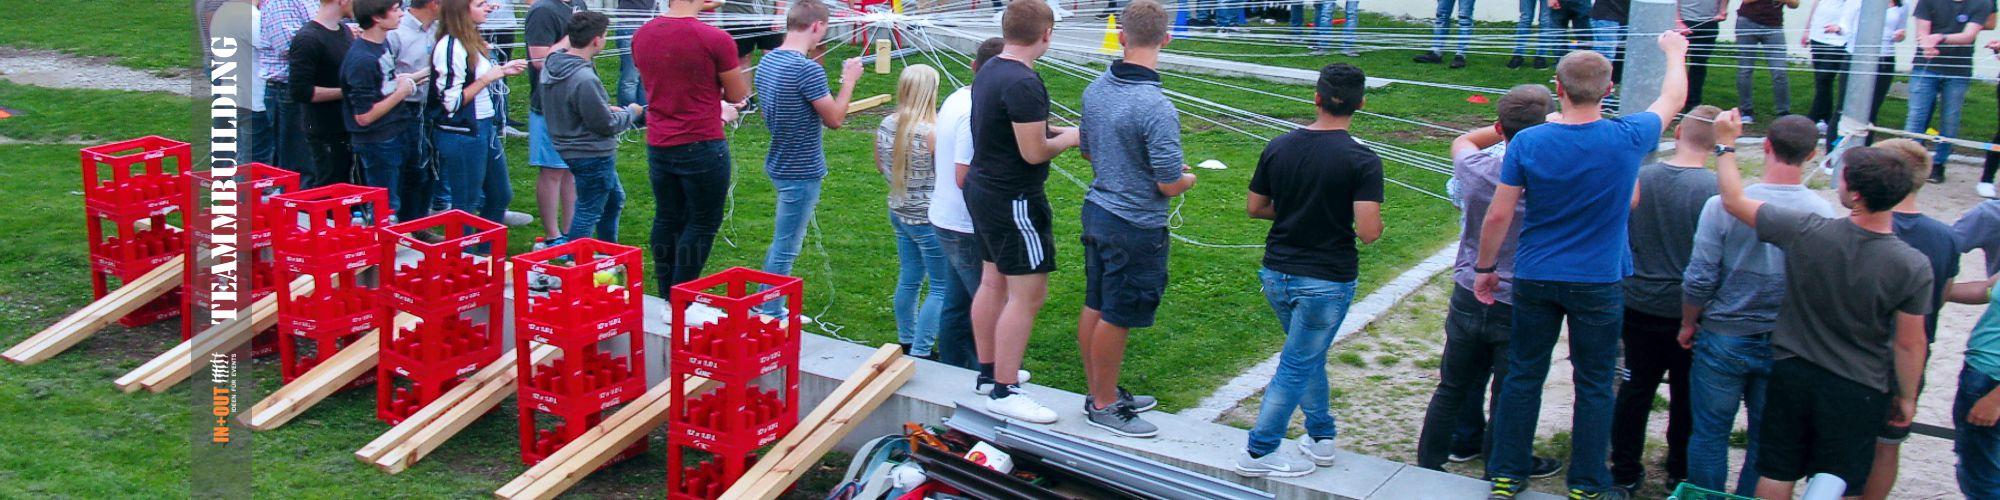 Ideen für Team Events - Azubi Camp - Team Event Rostock